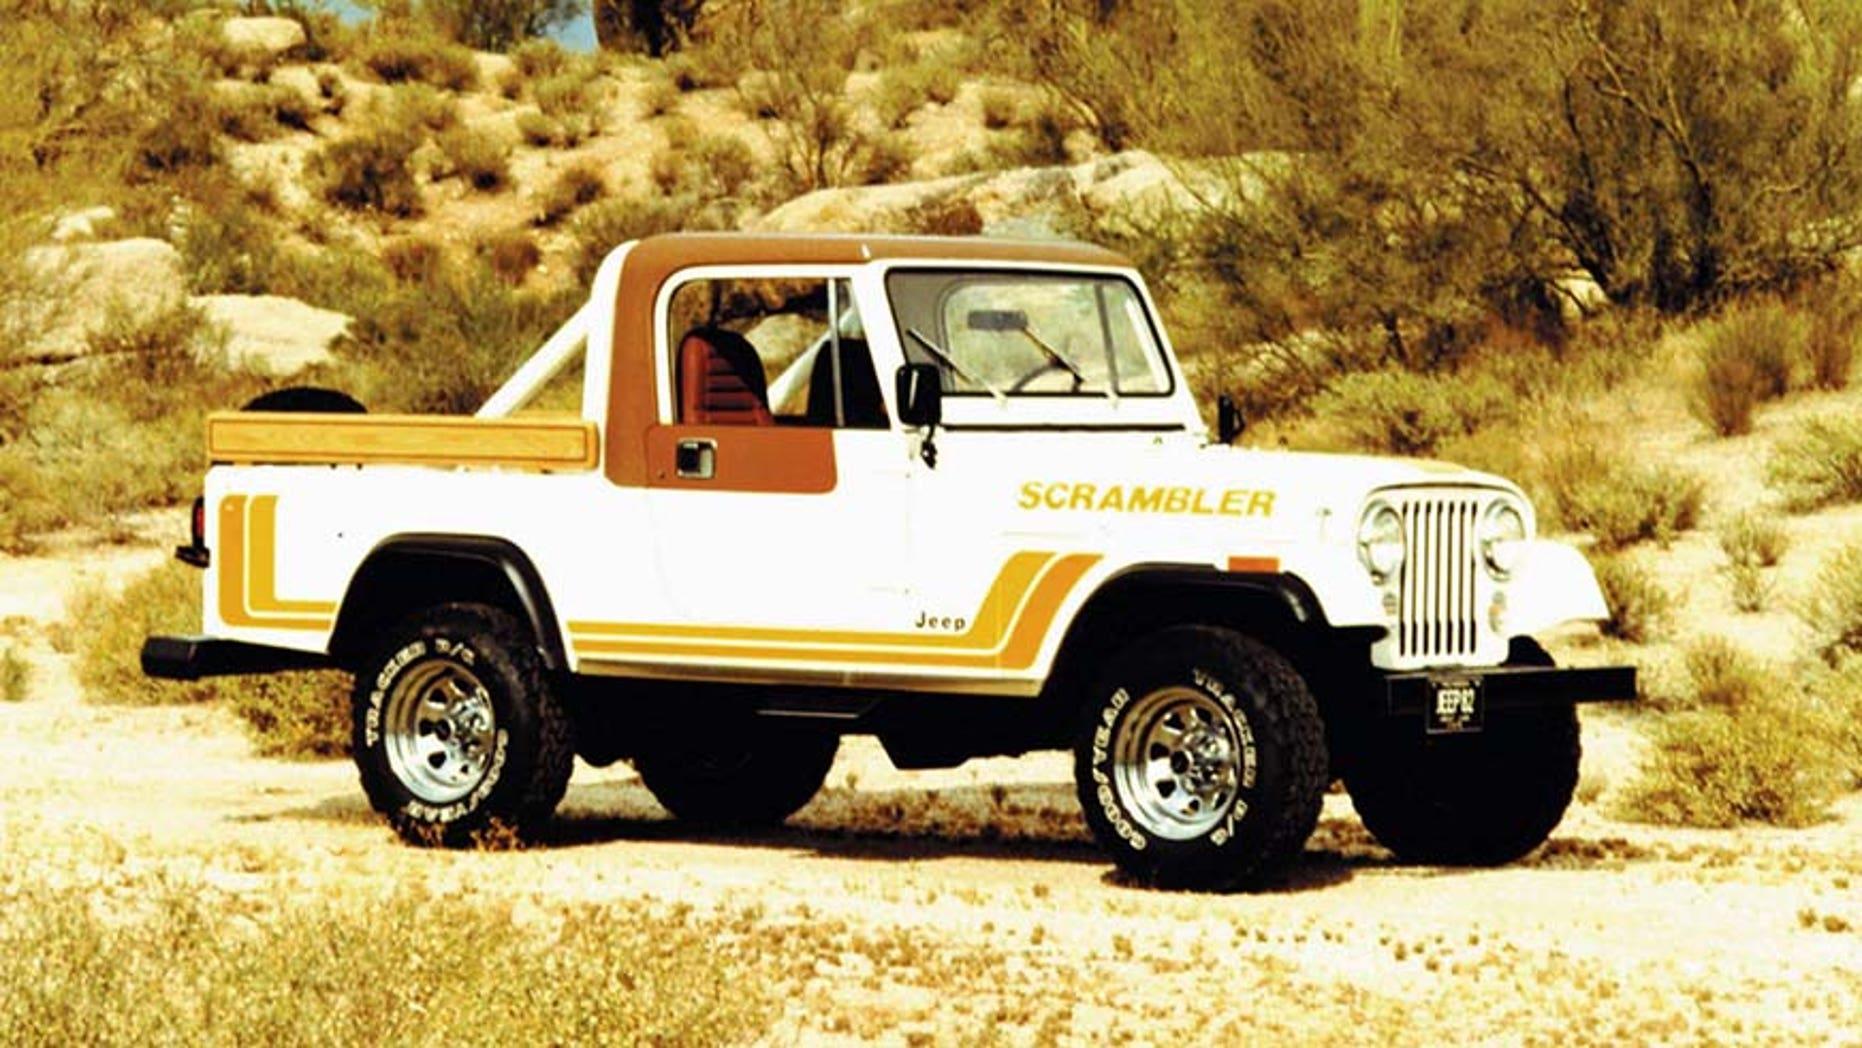 New Jeep Scrambler >> Jeep Scrambler Name To Return On New Pickup Report Says Fox News